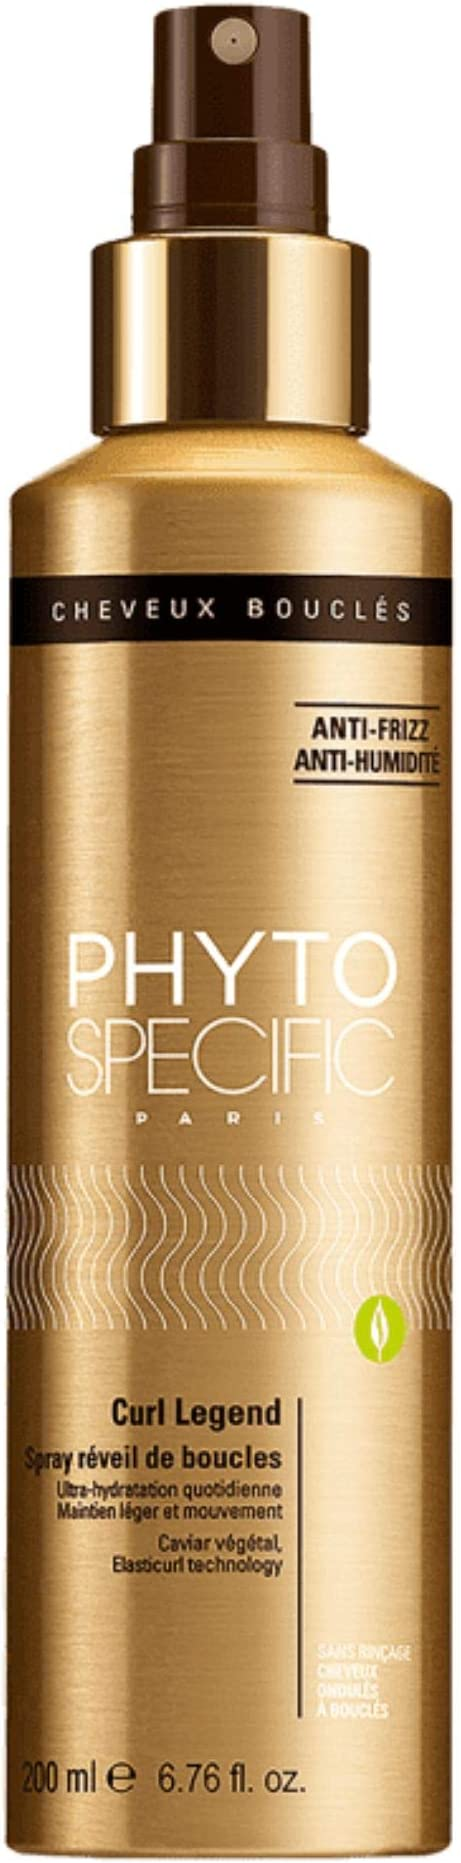 Phyto Phytospecific Curl Legend Spray Capelli Ravviva Ricci, 150ml